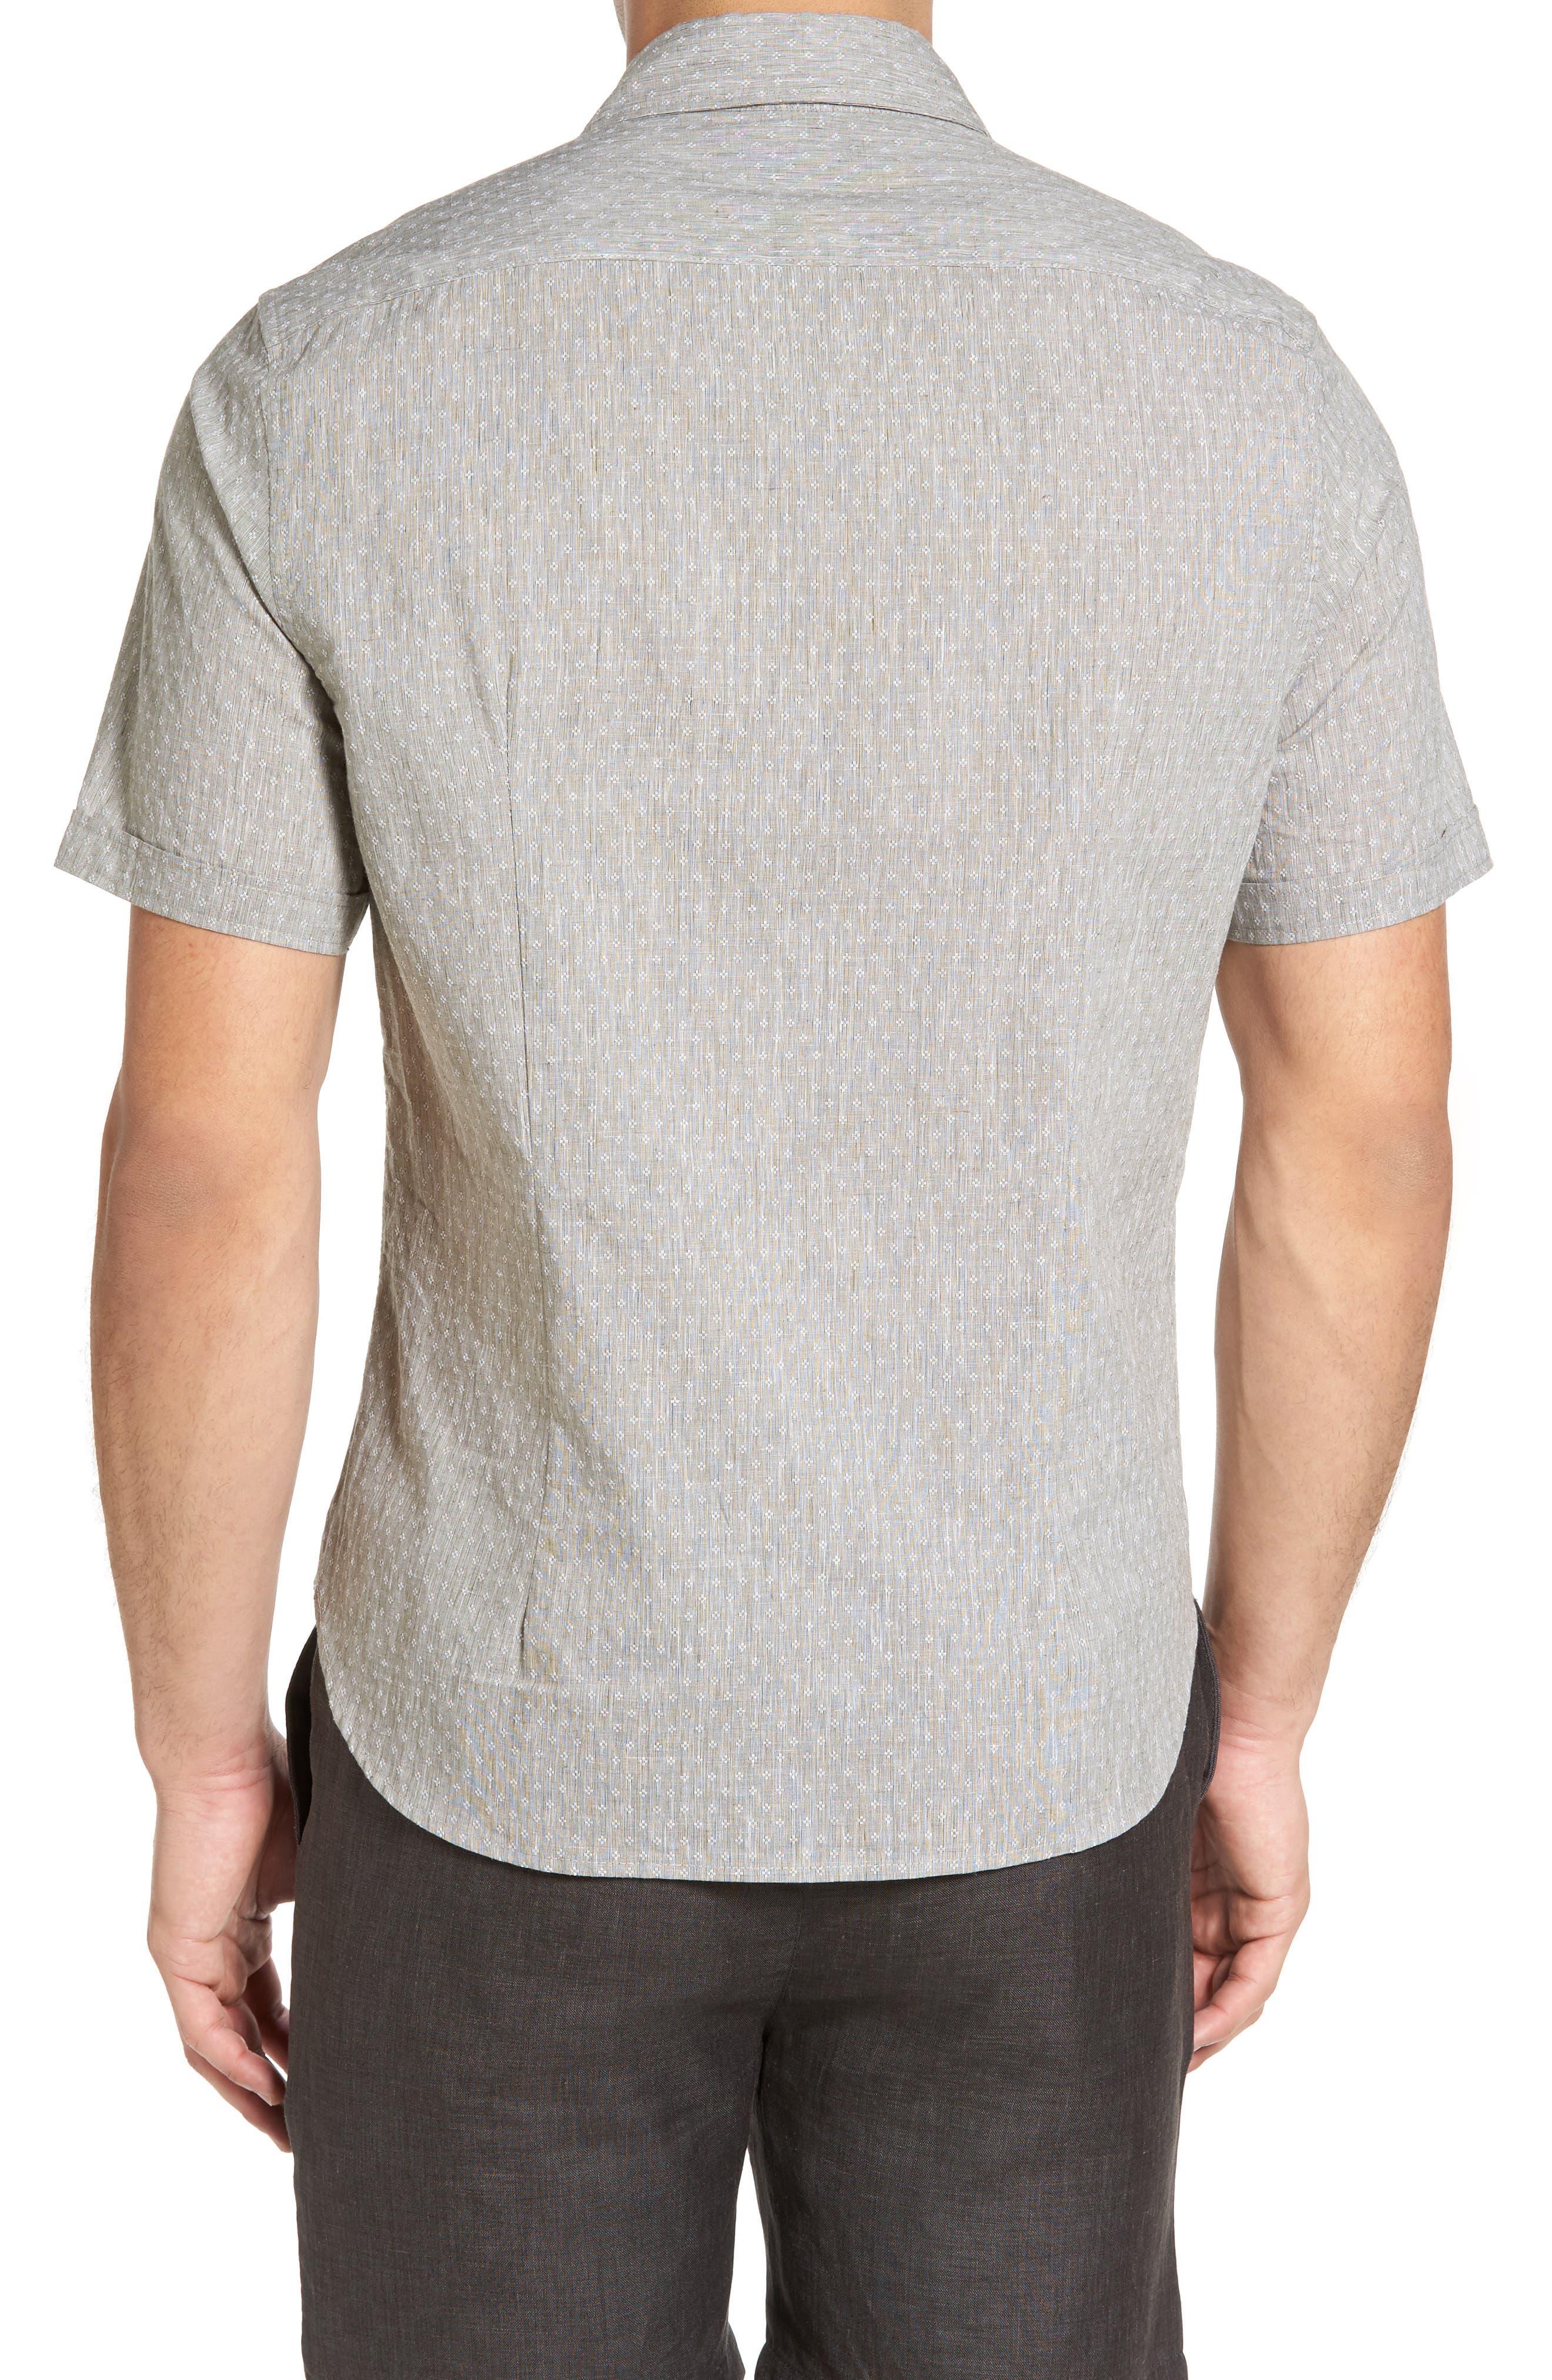 LANAI COLLECTION,                             Classic Fit Sport Shirt,                             Alternate thumbnail 2, color,                             310